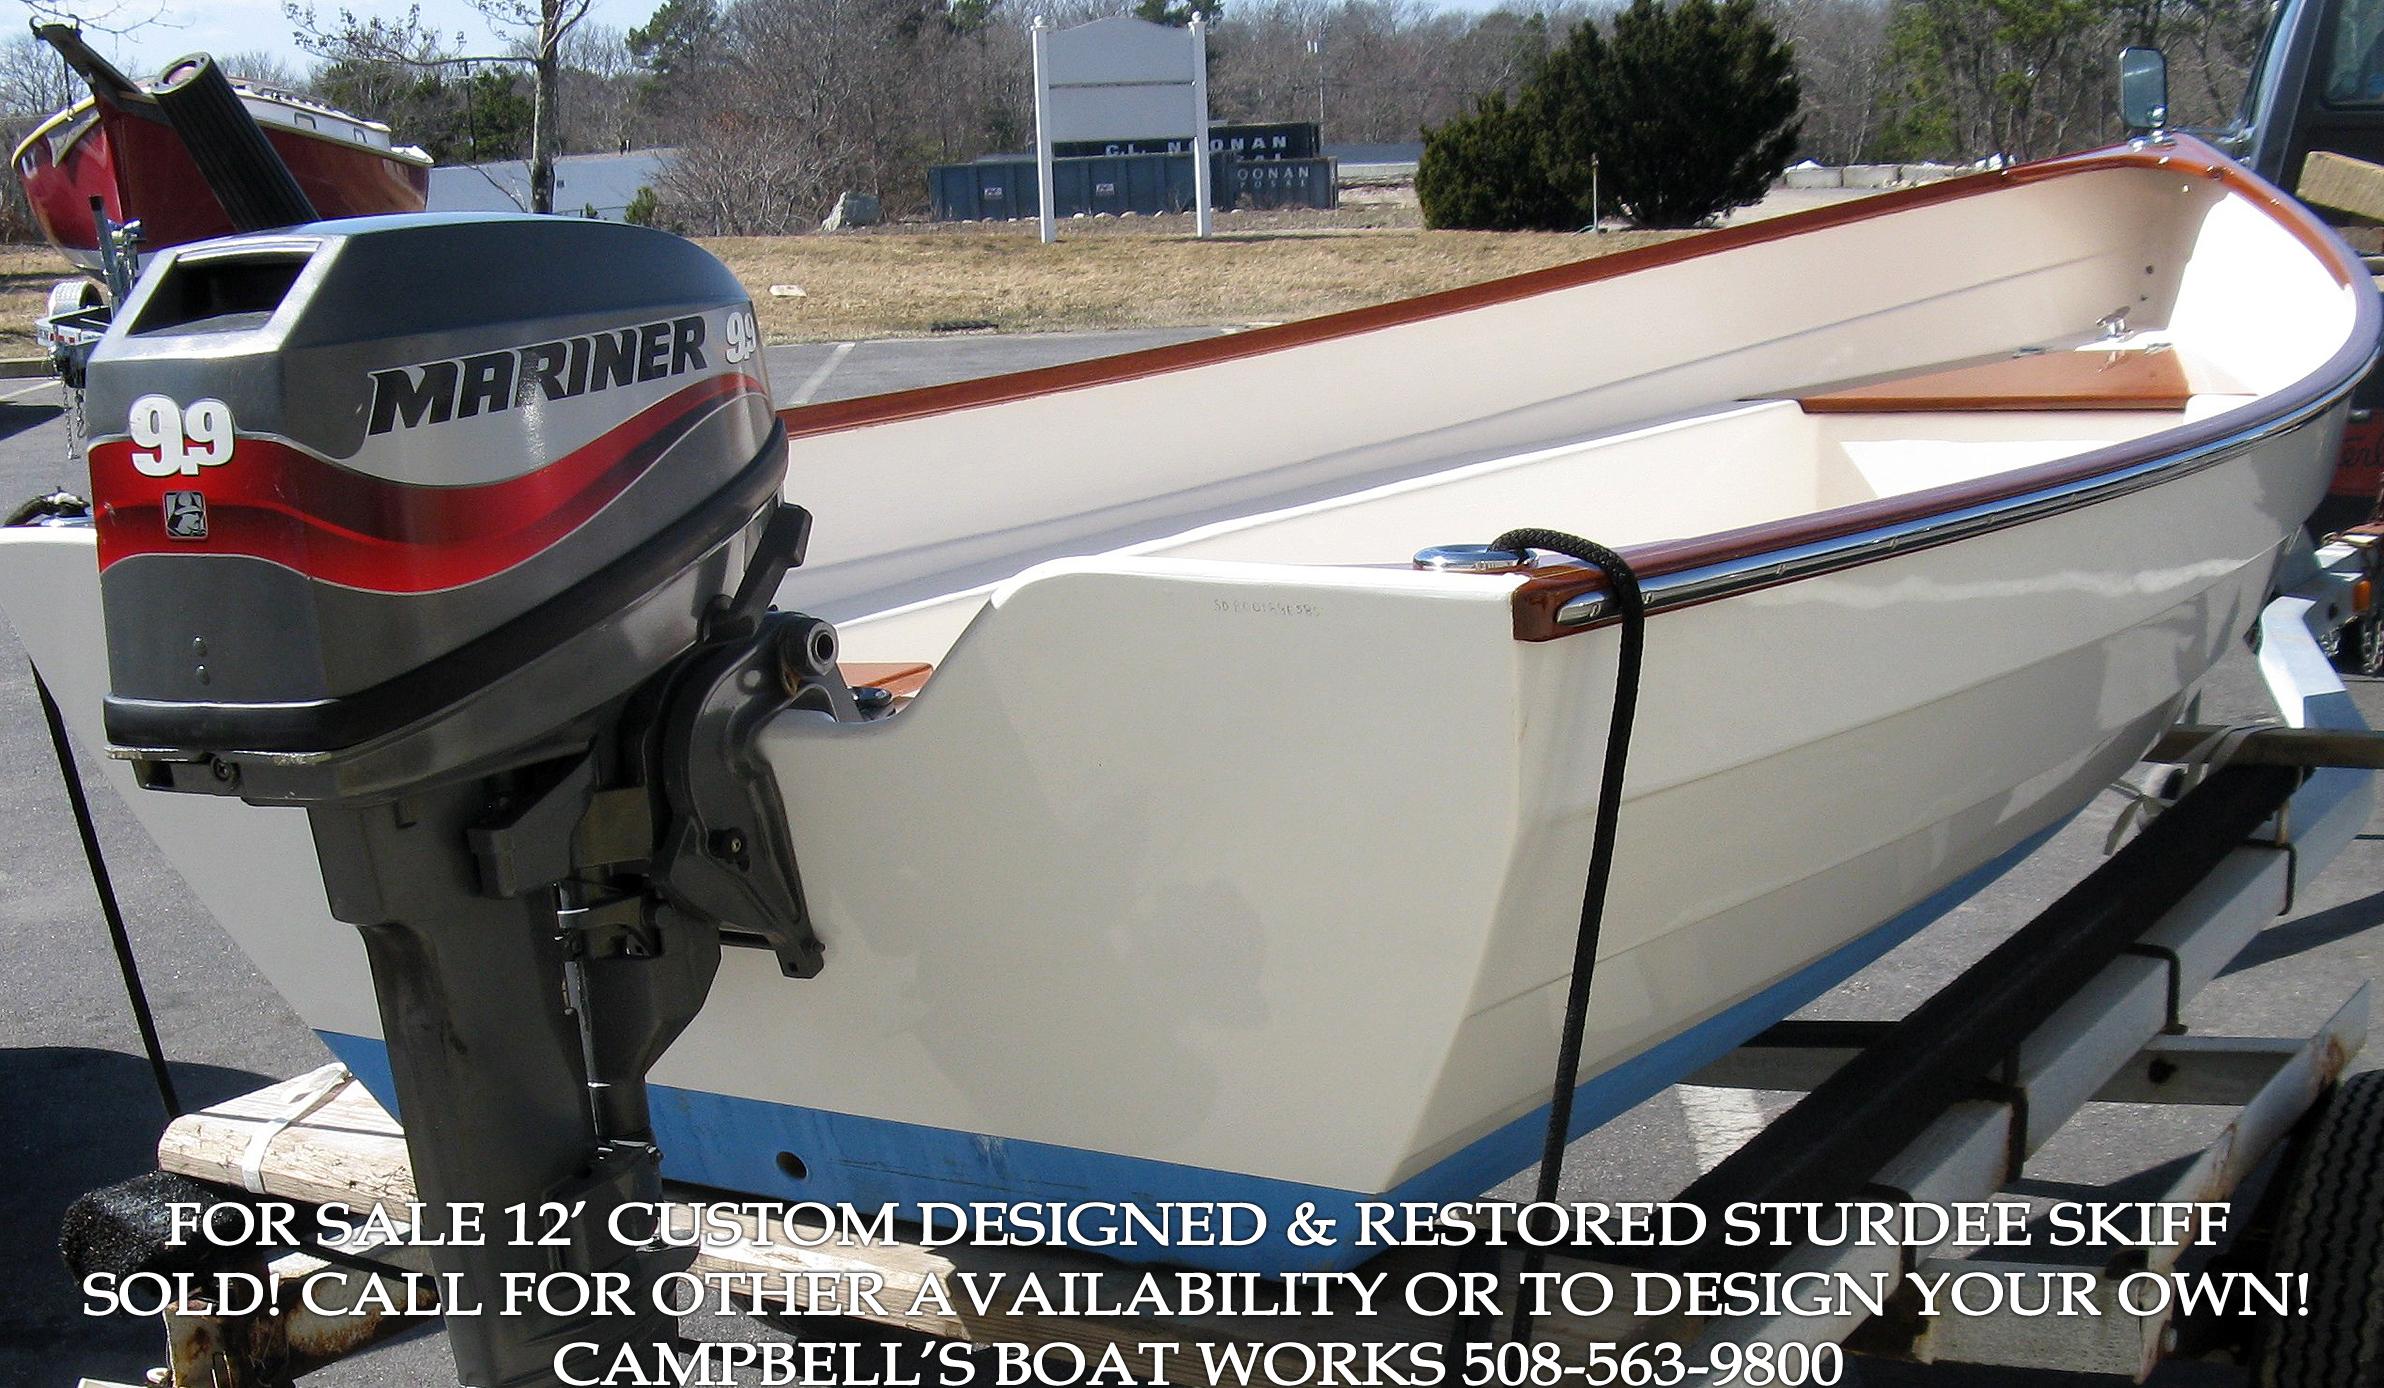 Boat For Sale 12' Custom Skiff Restored from a Sturdee Skiff